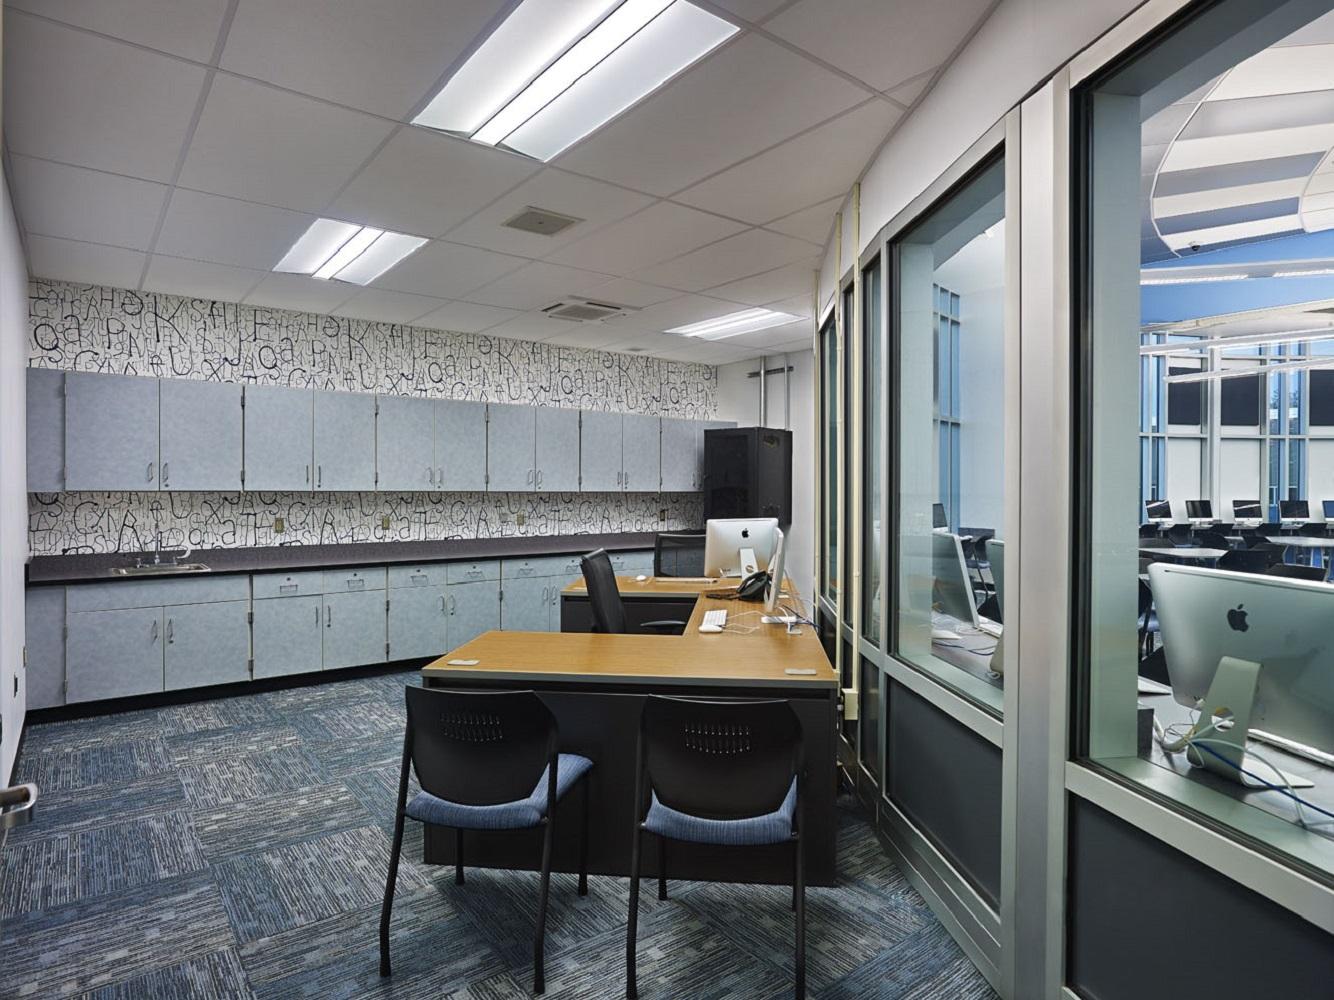 Interior - Administrative Room.jpg